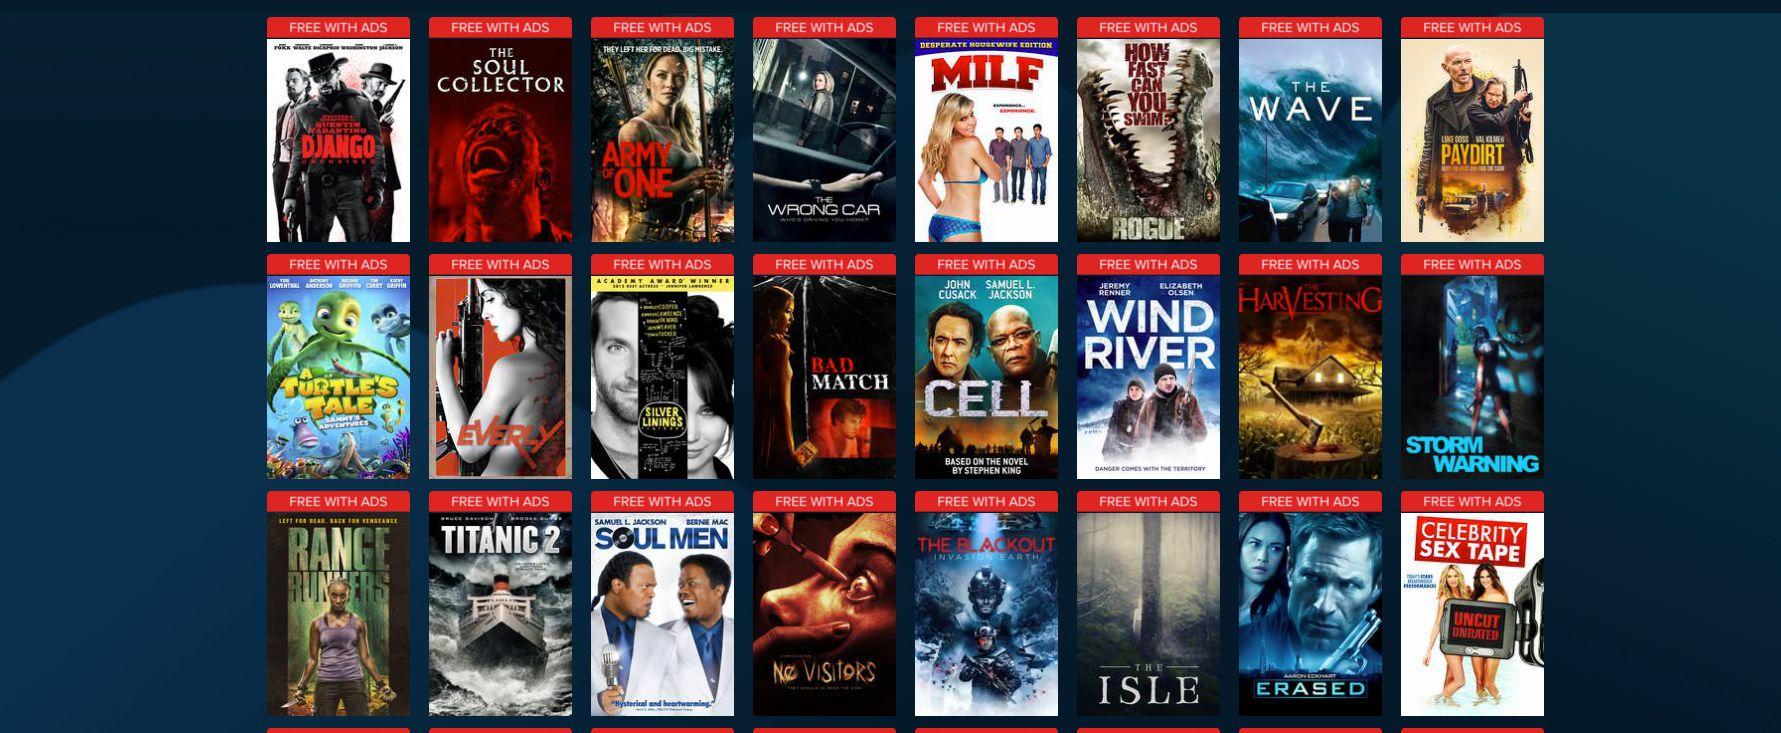 free vudu movies